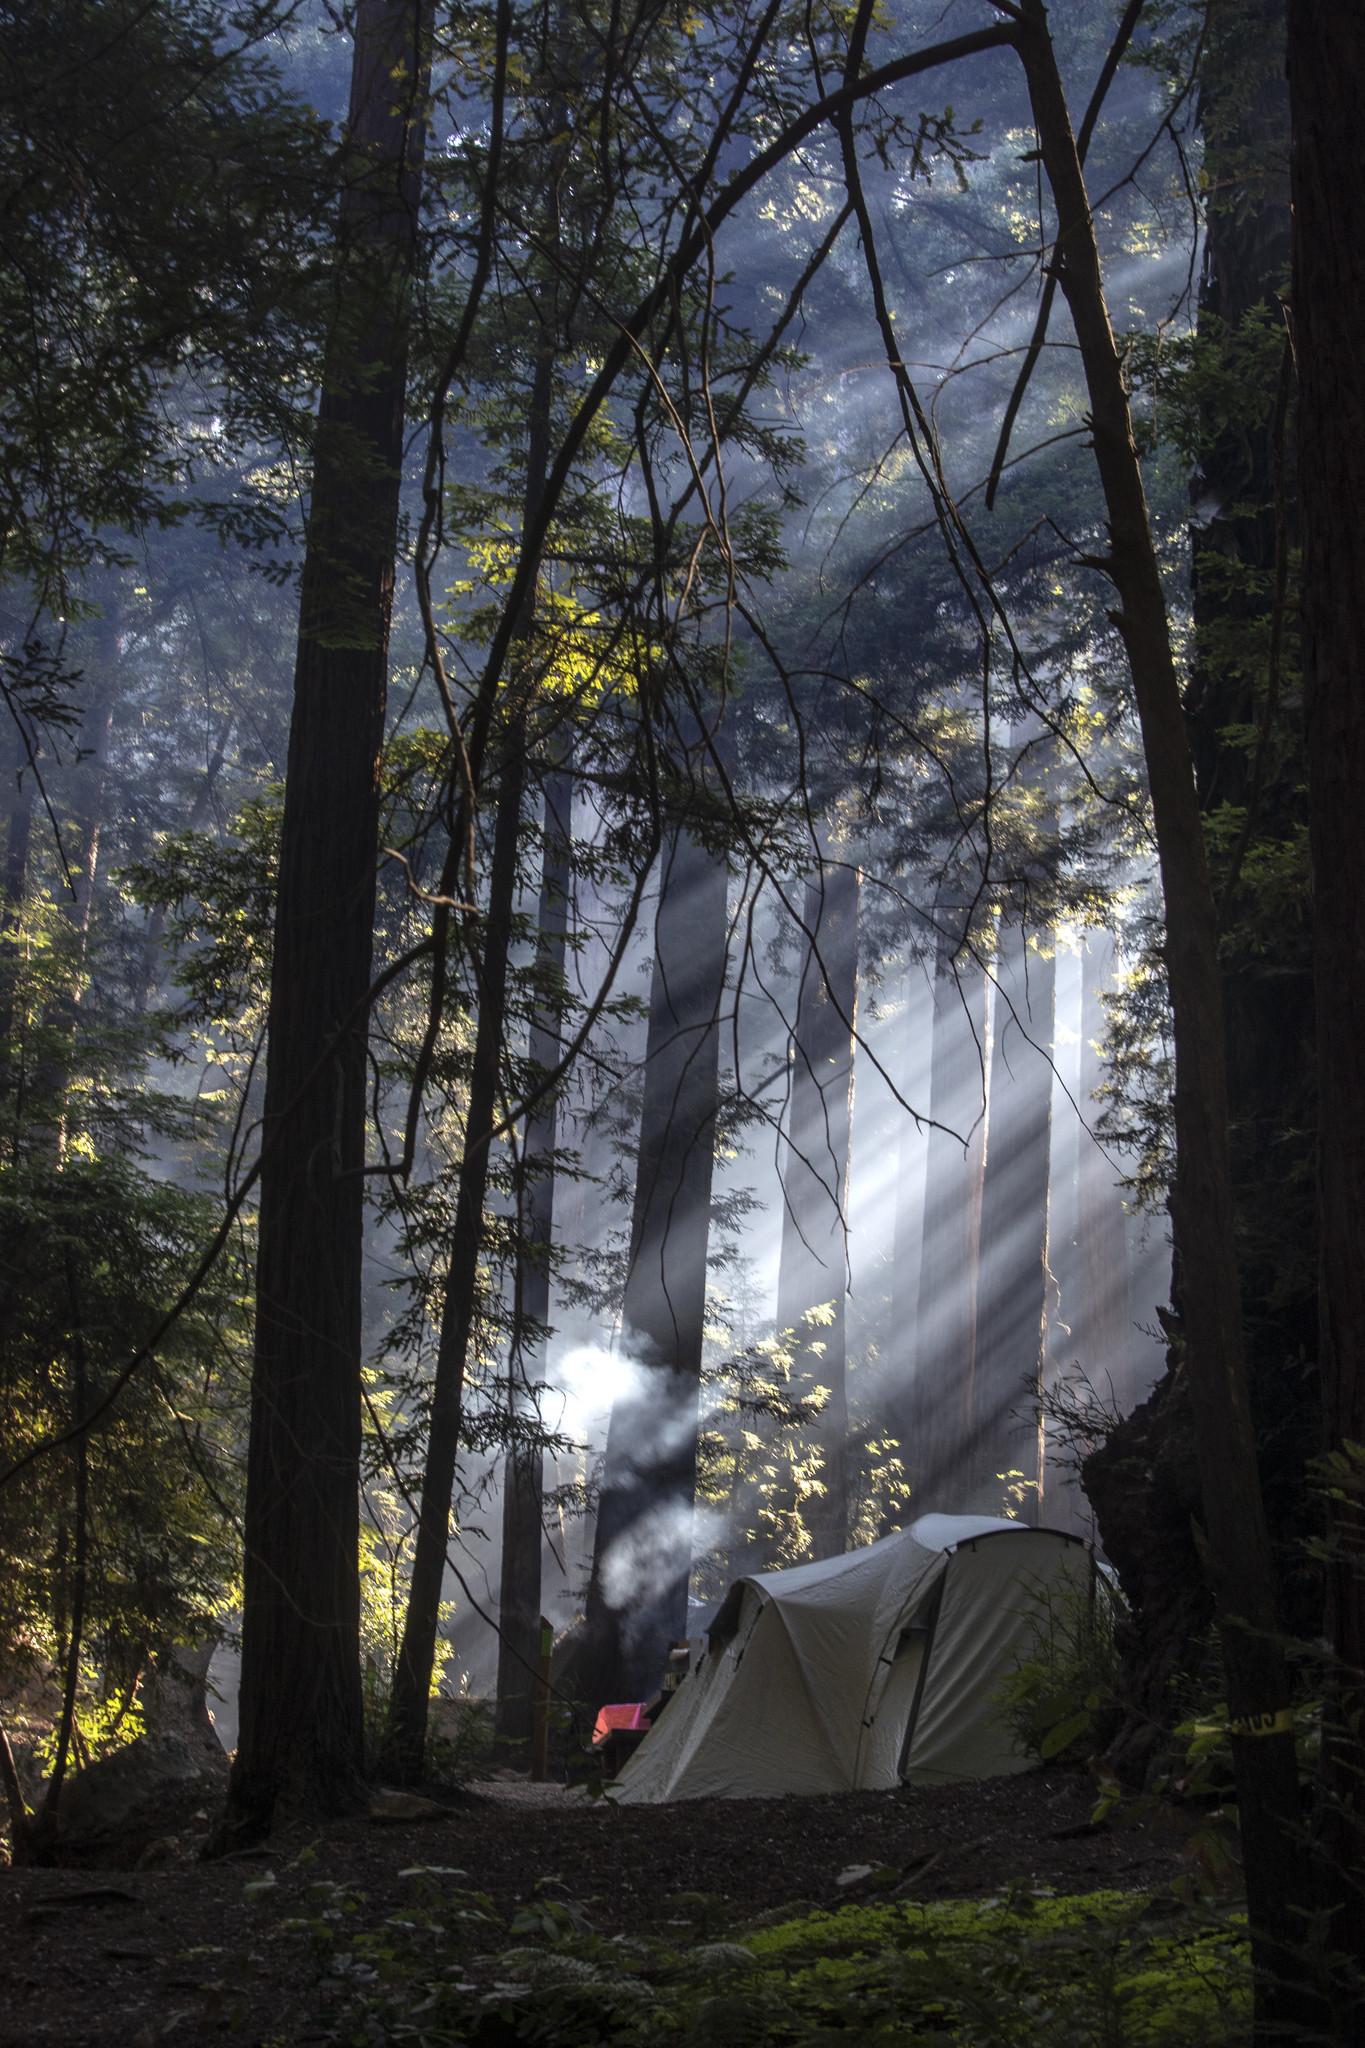 Ventana campground in Big Sur